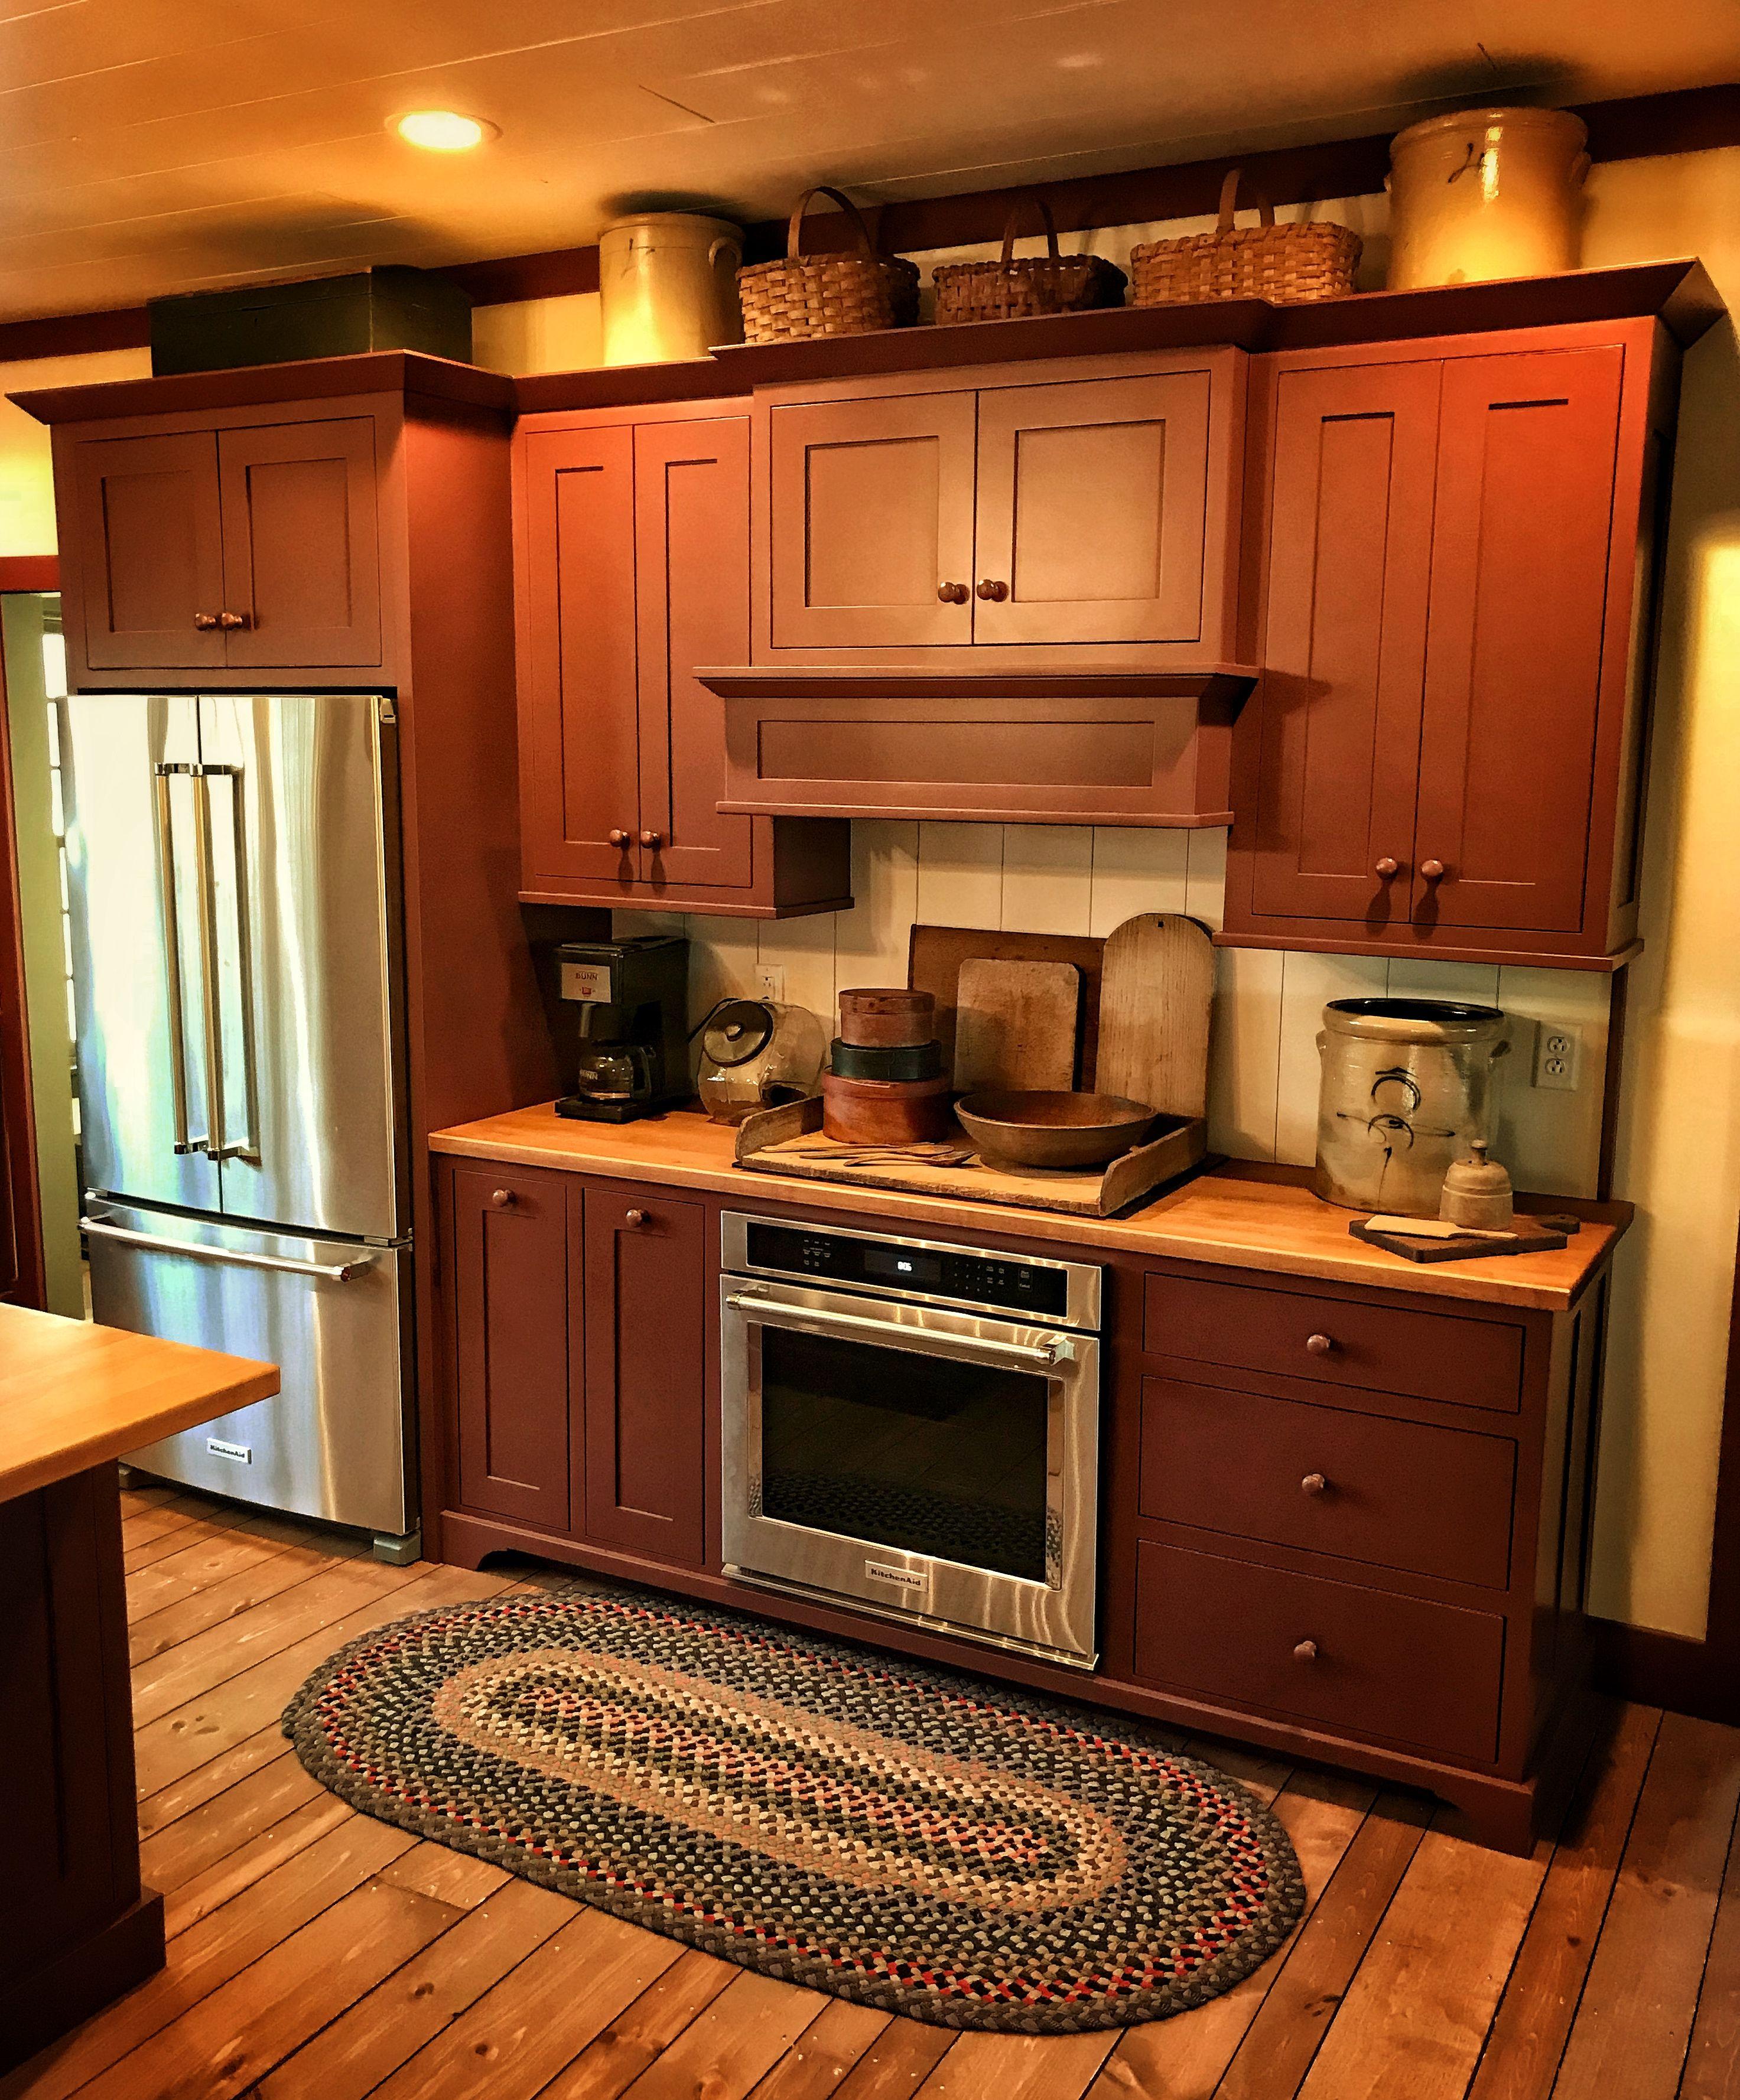 Primitive Kitchen Primitive Kitchen Cabinets Country Kitchen Rustic Kitchen